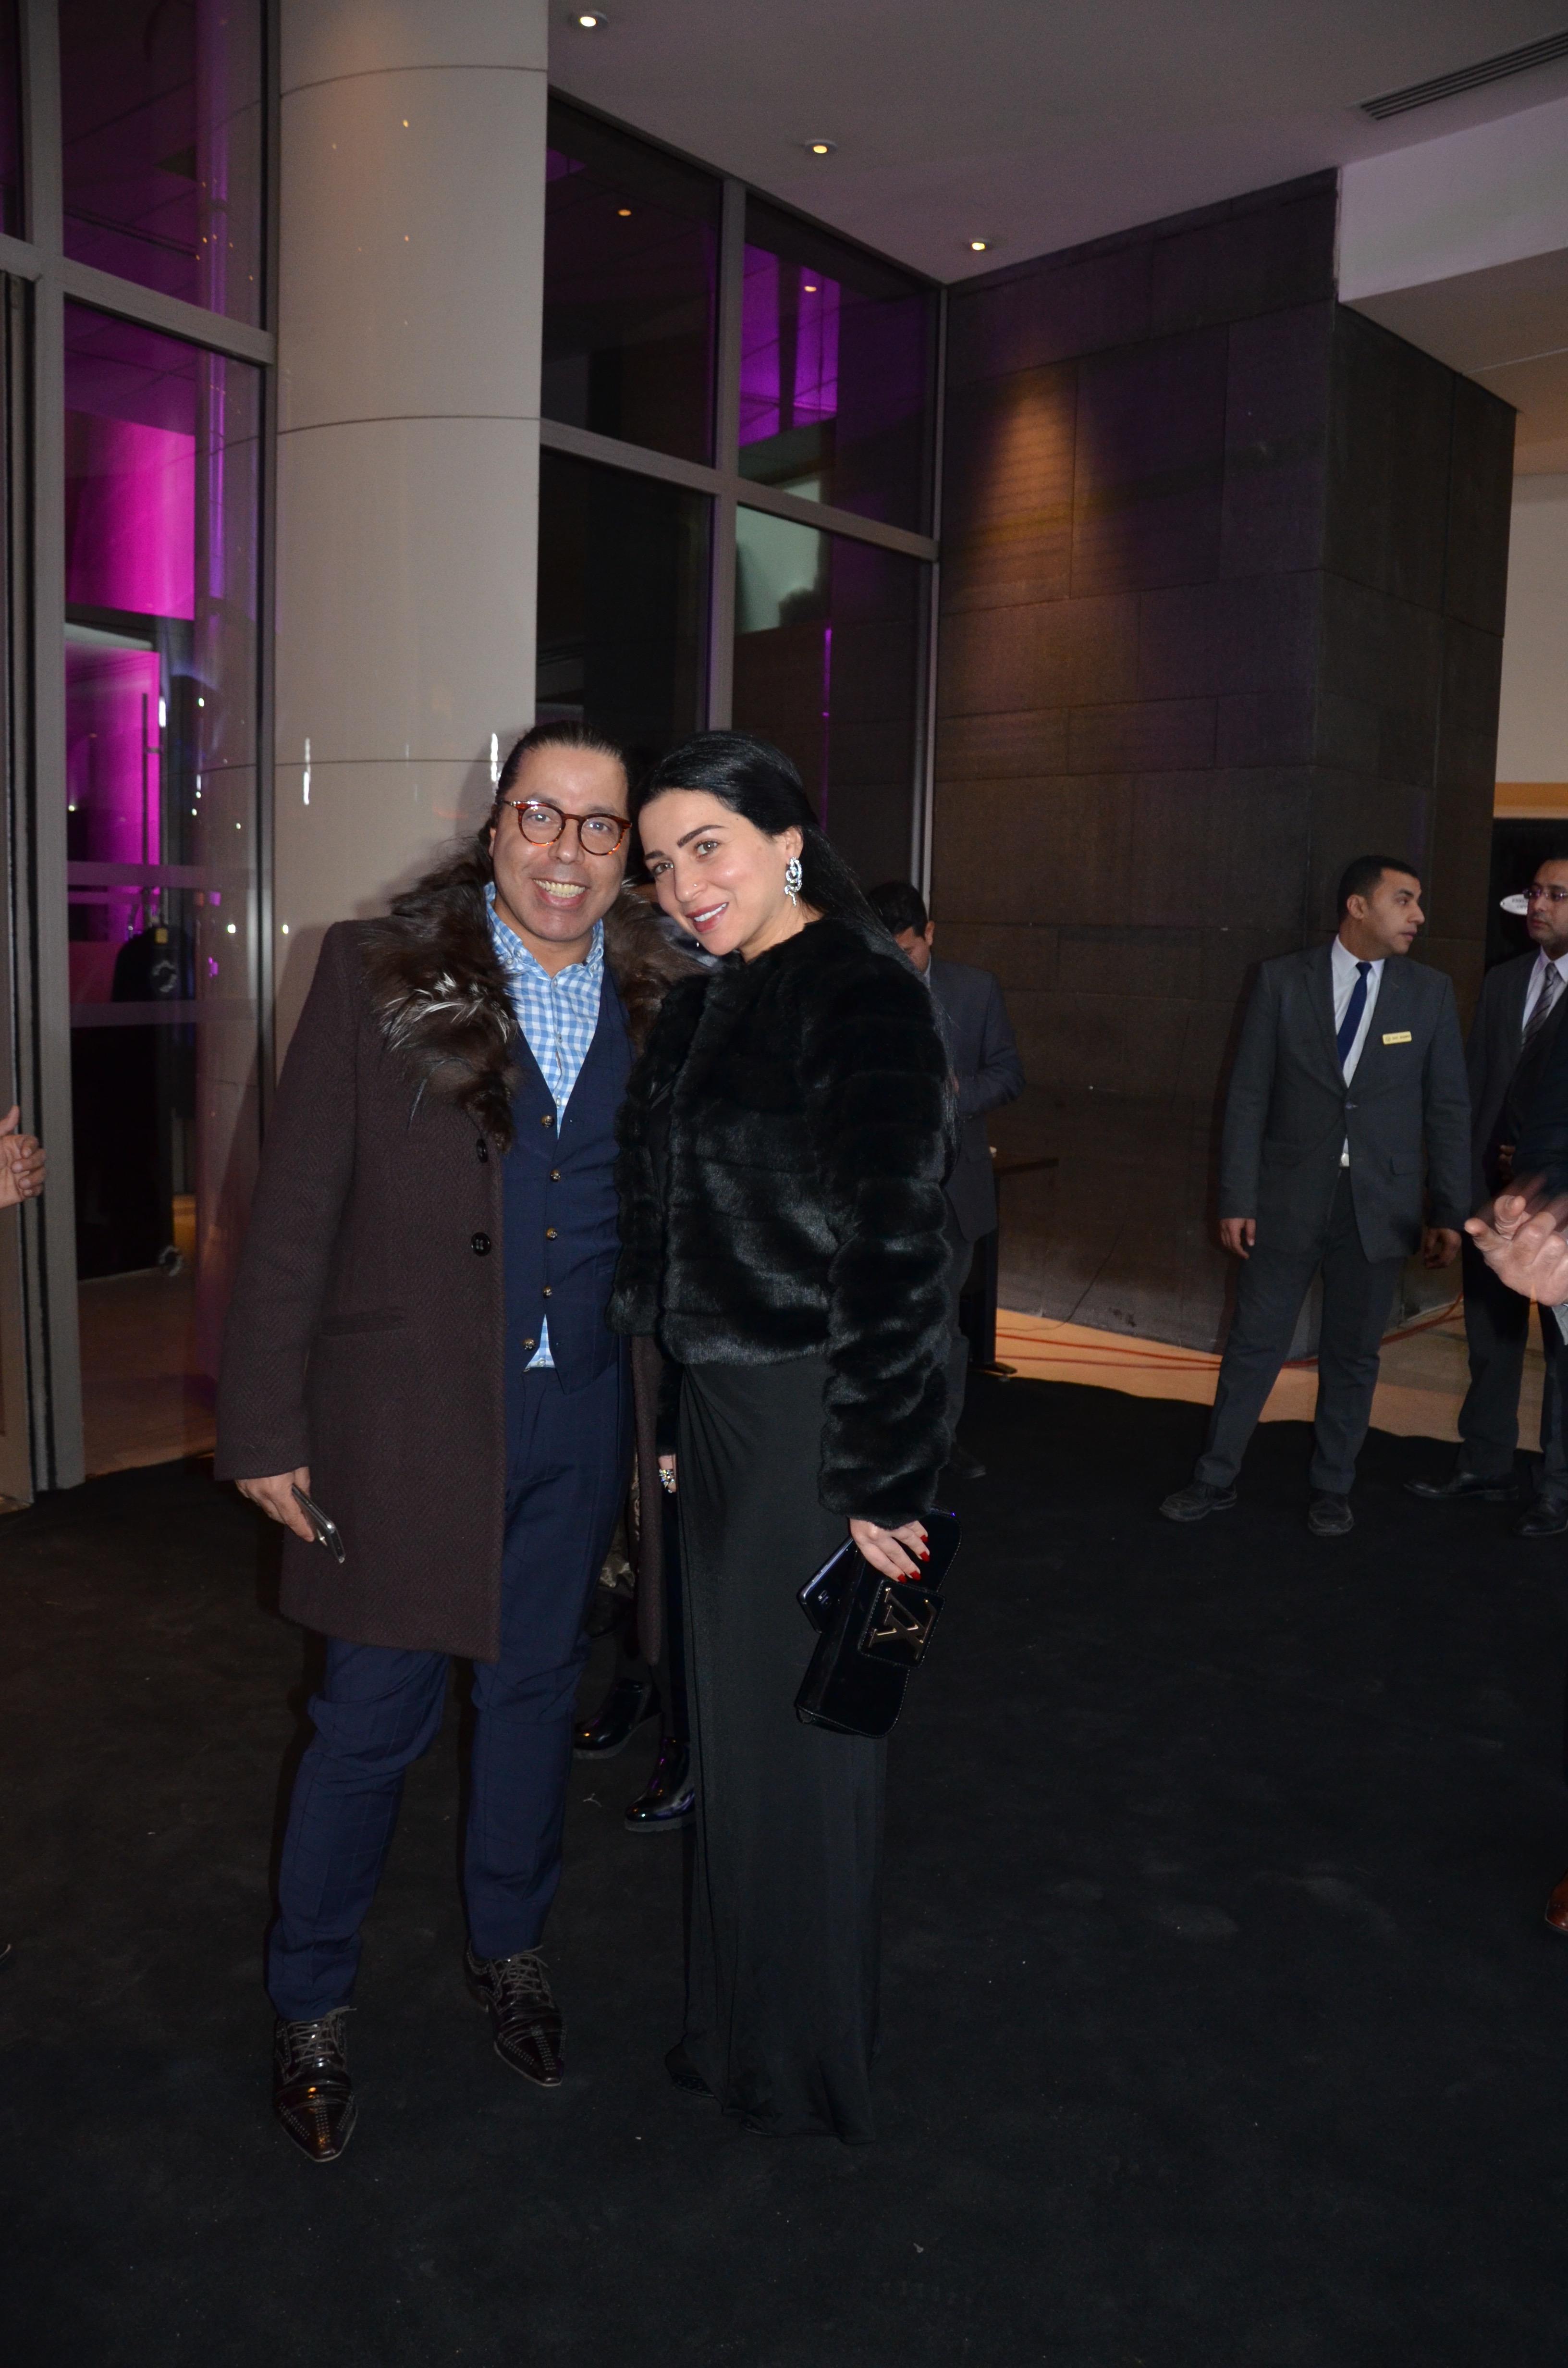 Mai Ezz Eldin and Sosha